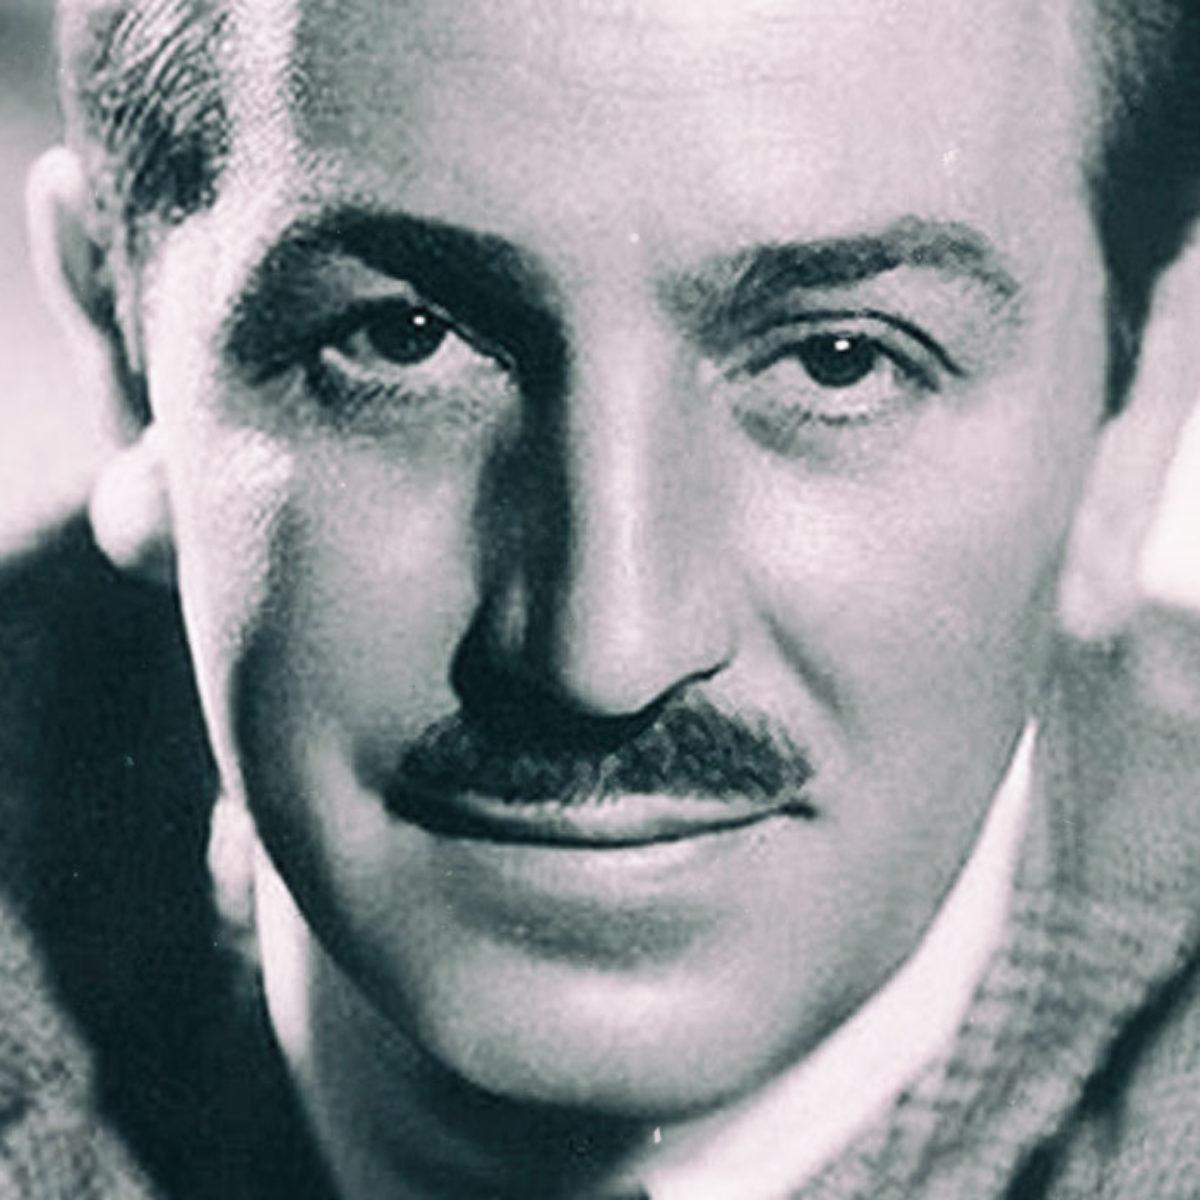 Frasi Dolci Walt Disney.Le 35 Piu Belle Frasi Di Walt Disney In Inglese Con Traduzione